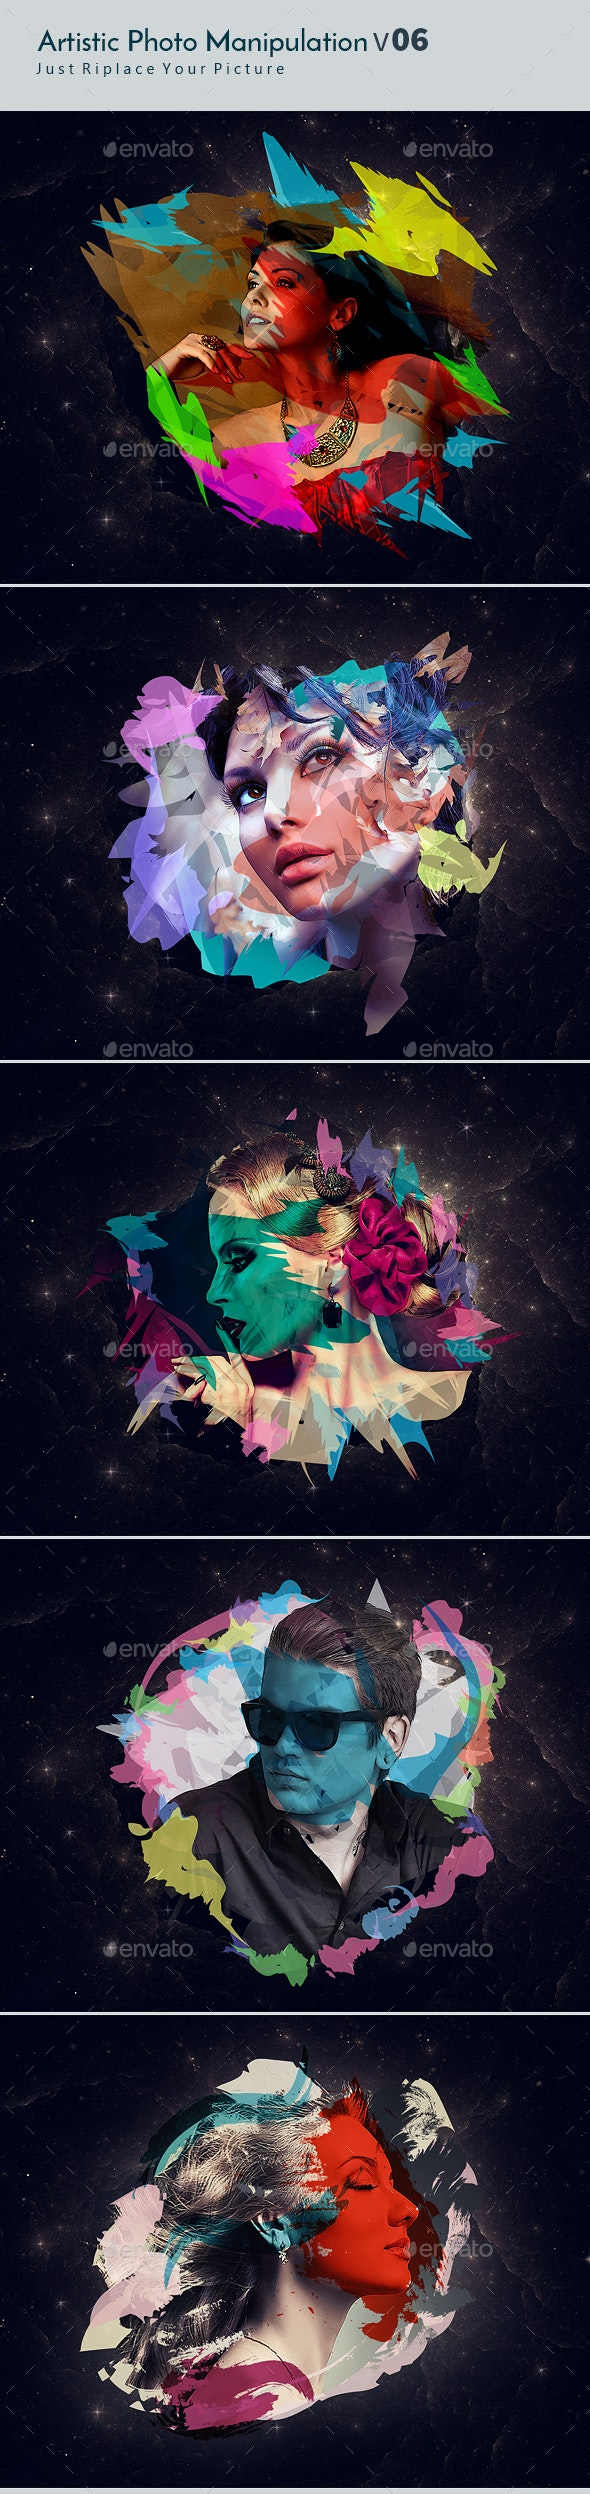 Artstic Photo Manipulation v06 - Photo Templates Graphics